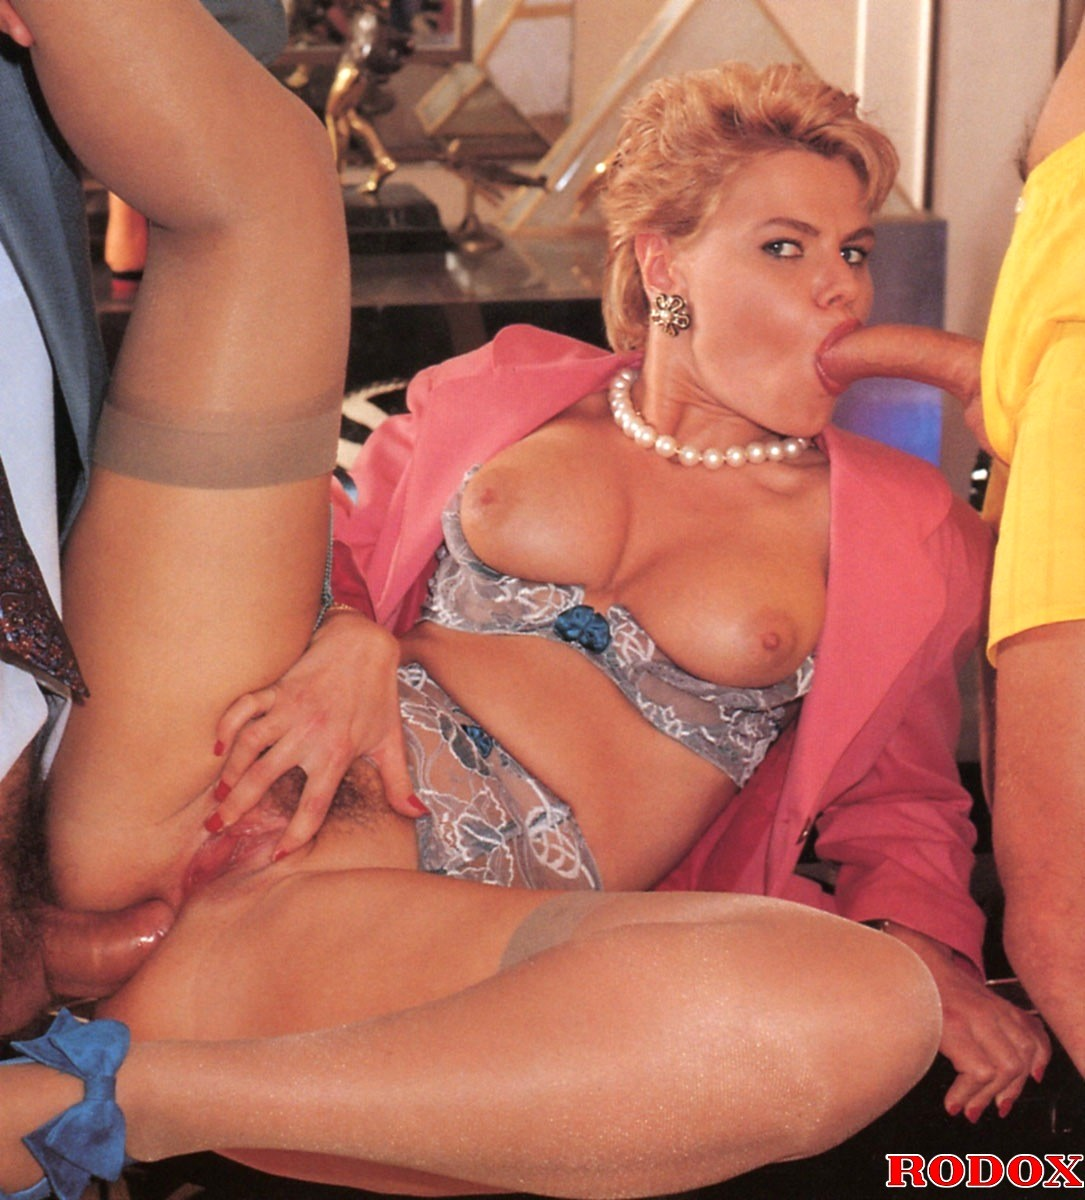 Rodox Rodox Model Top Rated Pornstars Territory Sex Hd Pics-7681